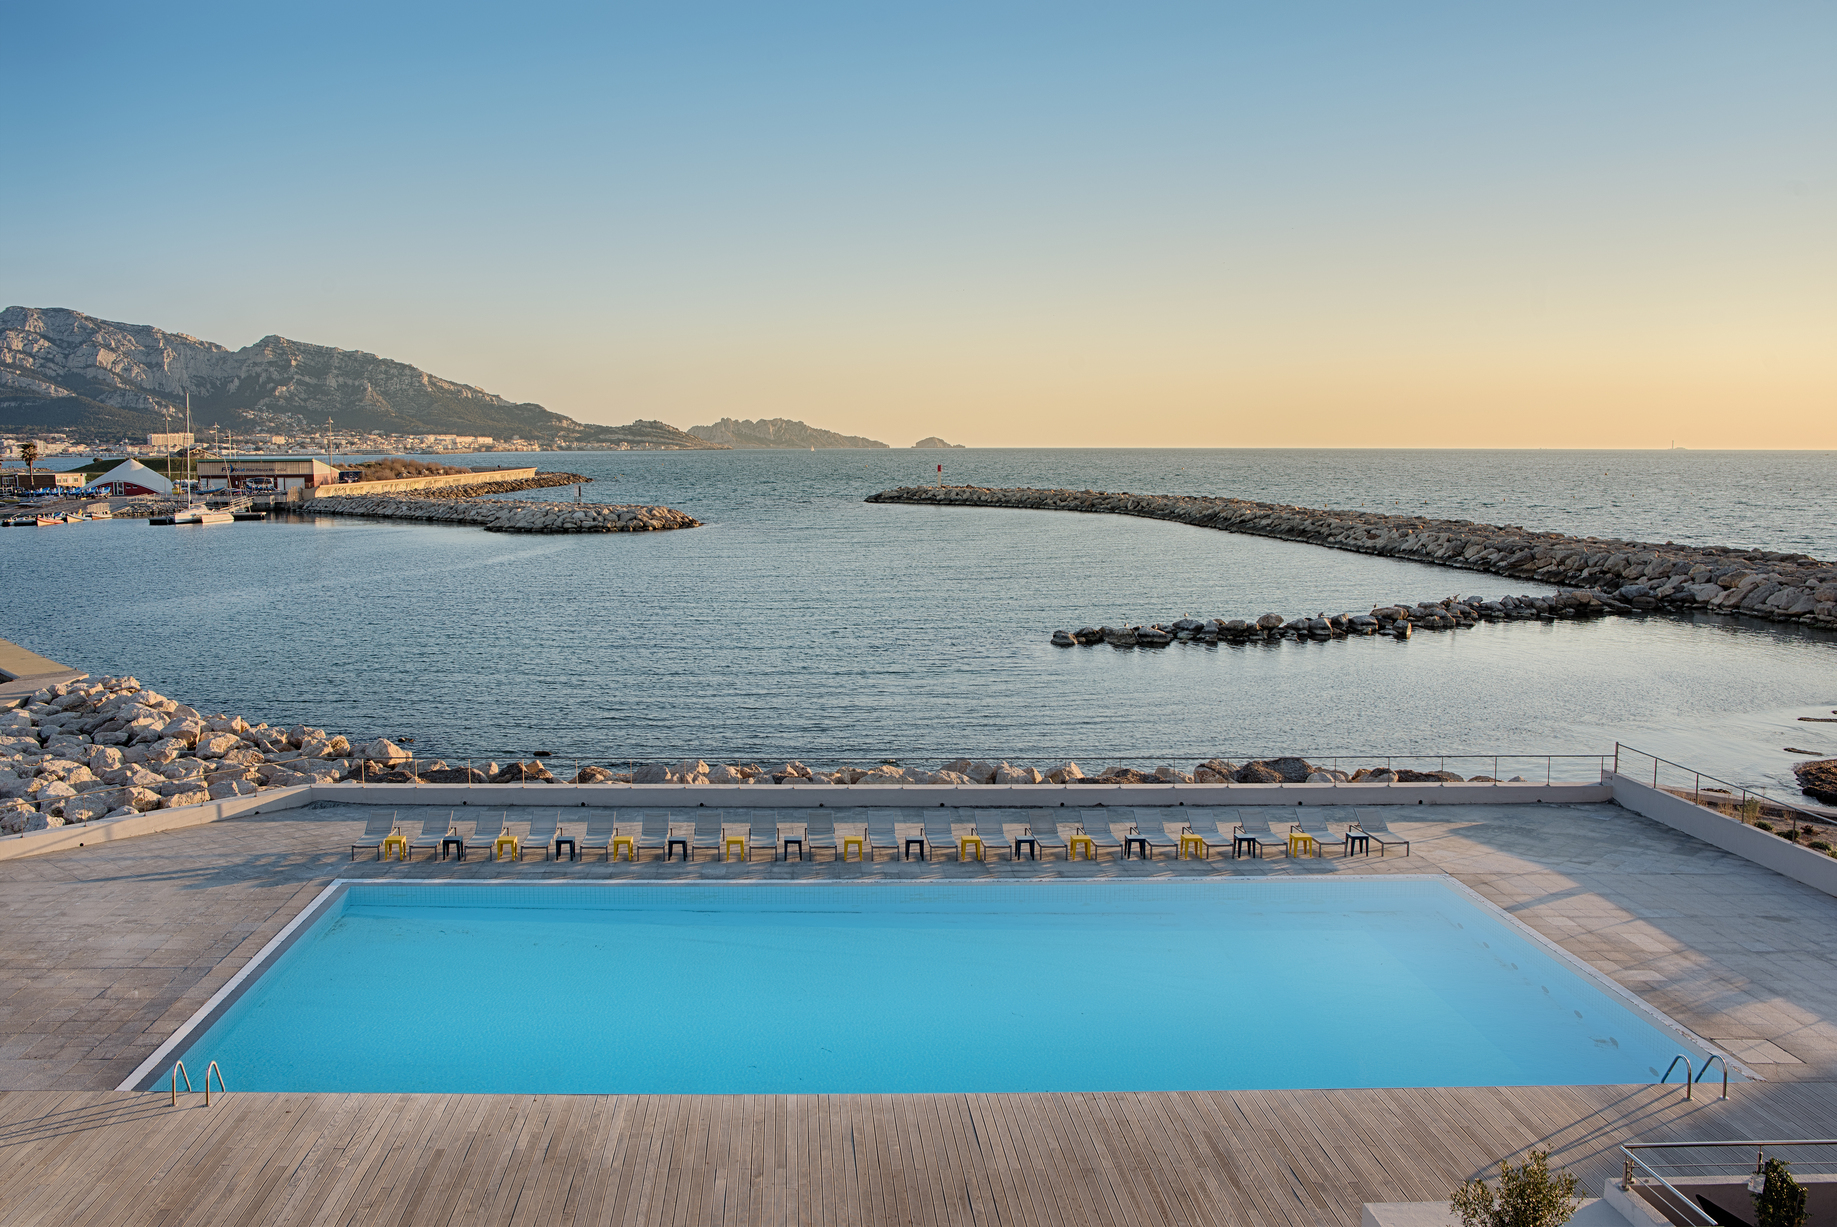 Relaxing Spa In Nhow Marseille | Nhow Marseille Hotel avec Hotel Piscine Marseille